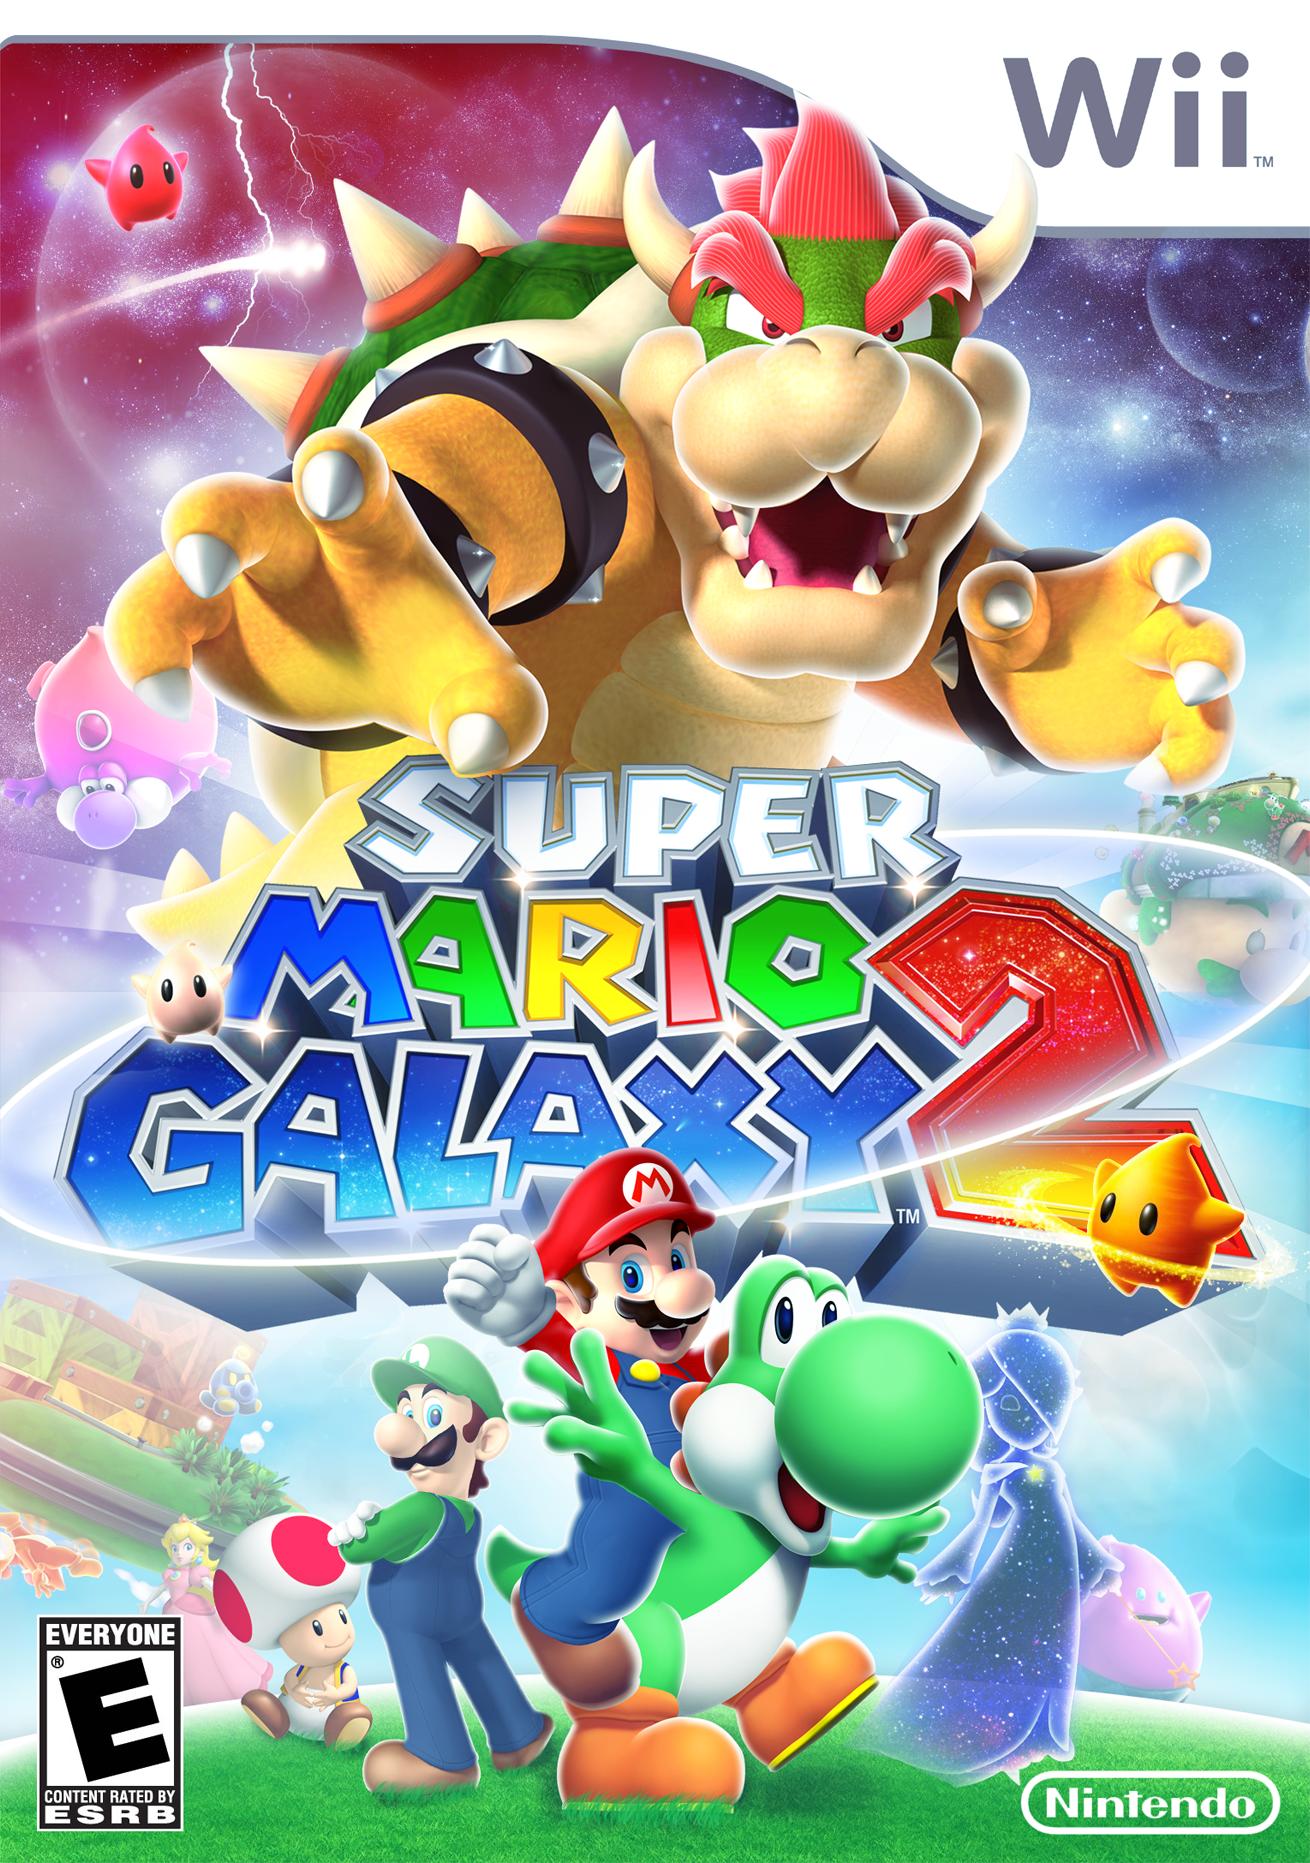 super mario galaxy 2 details  launchbox games database